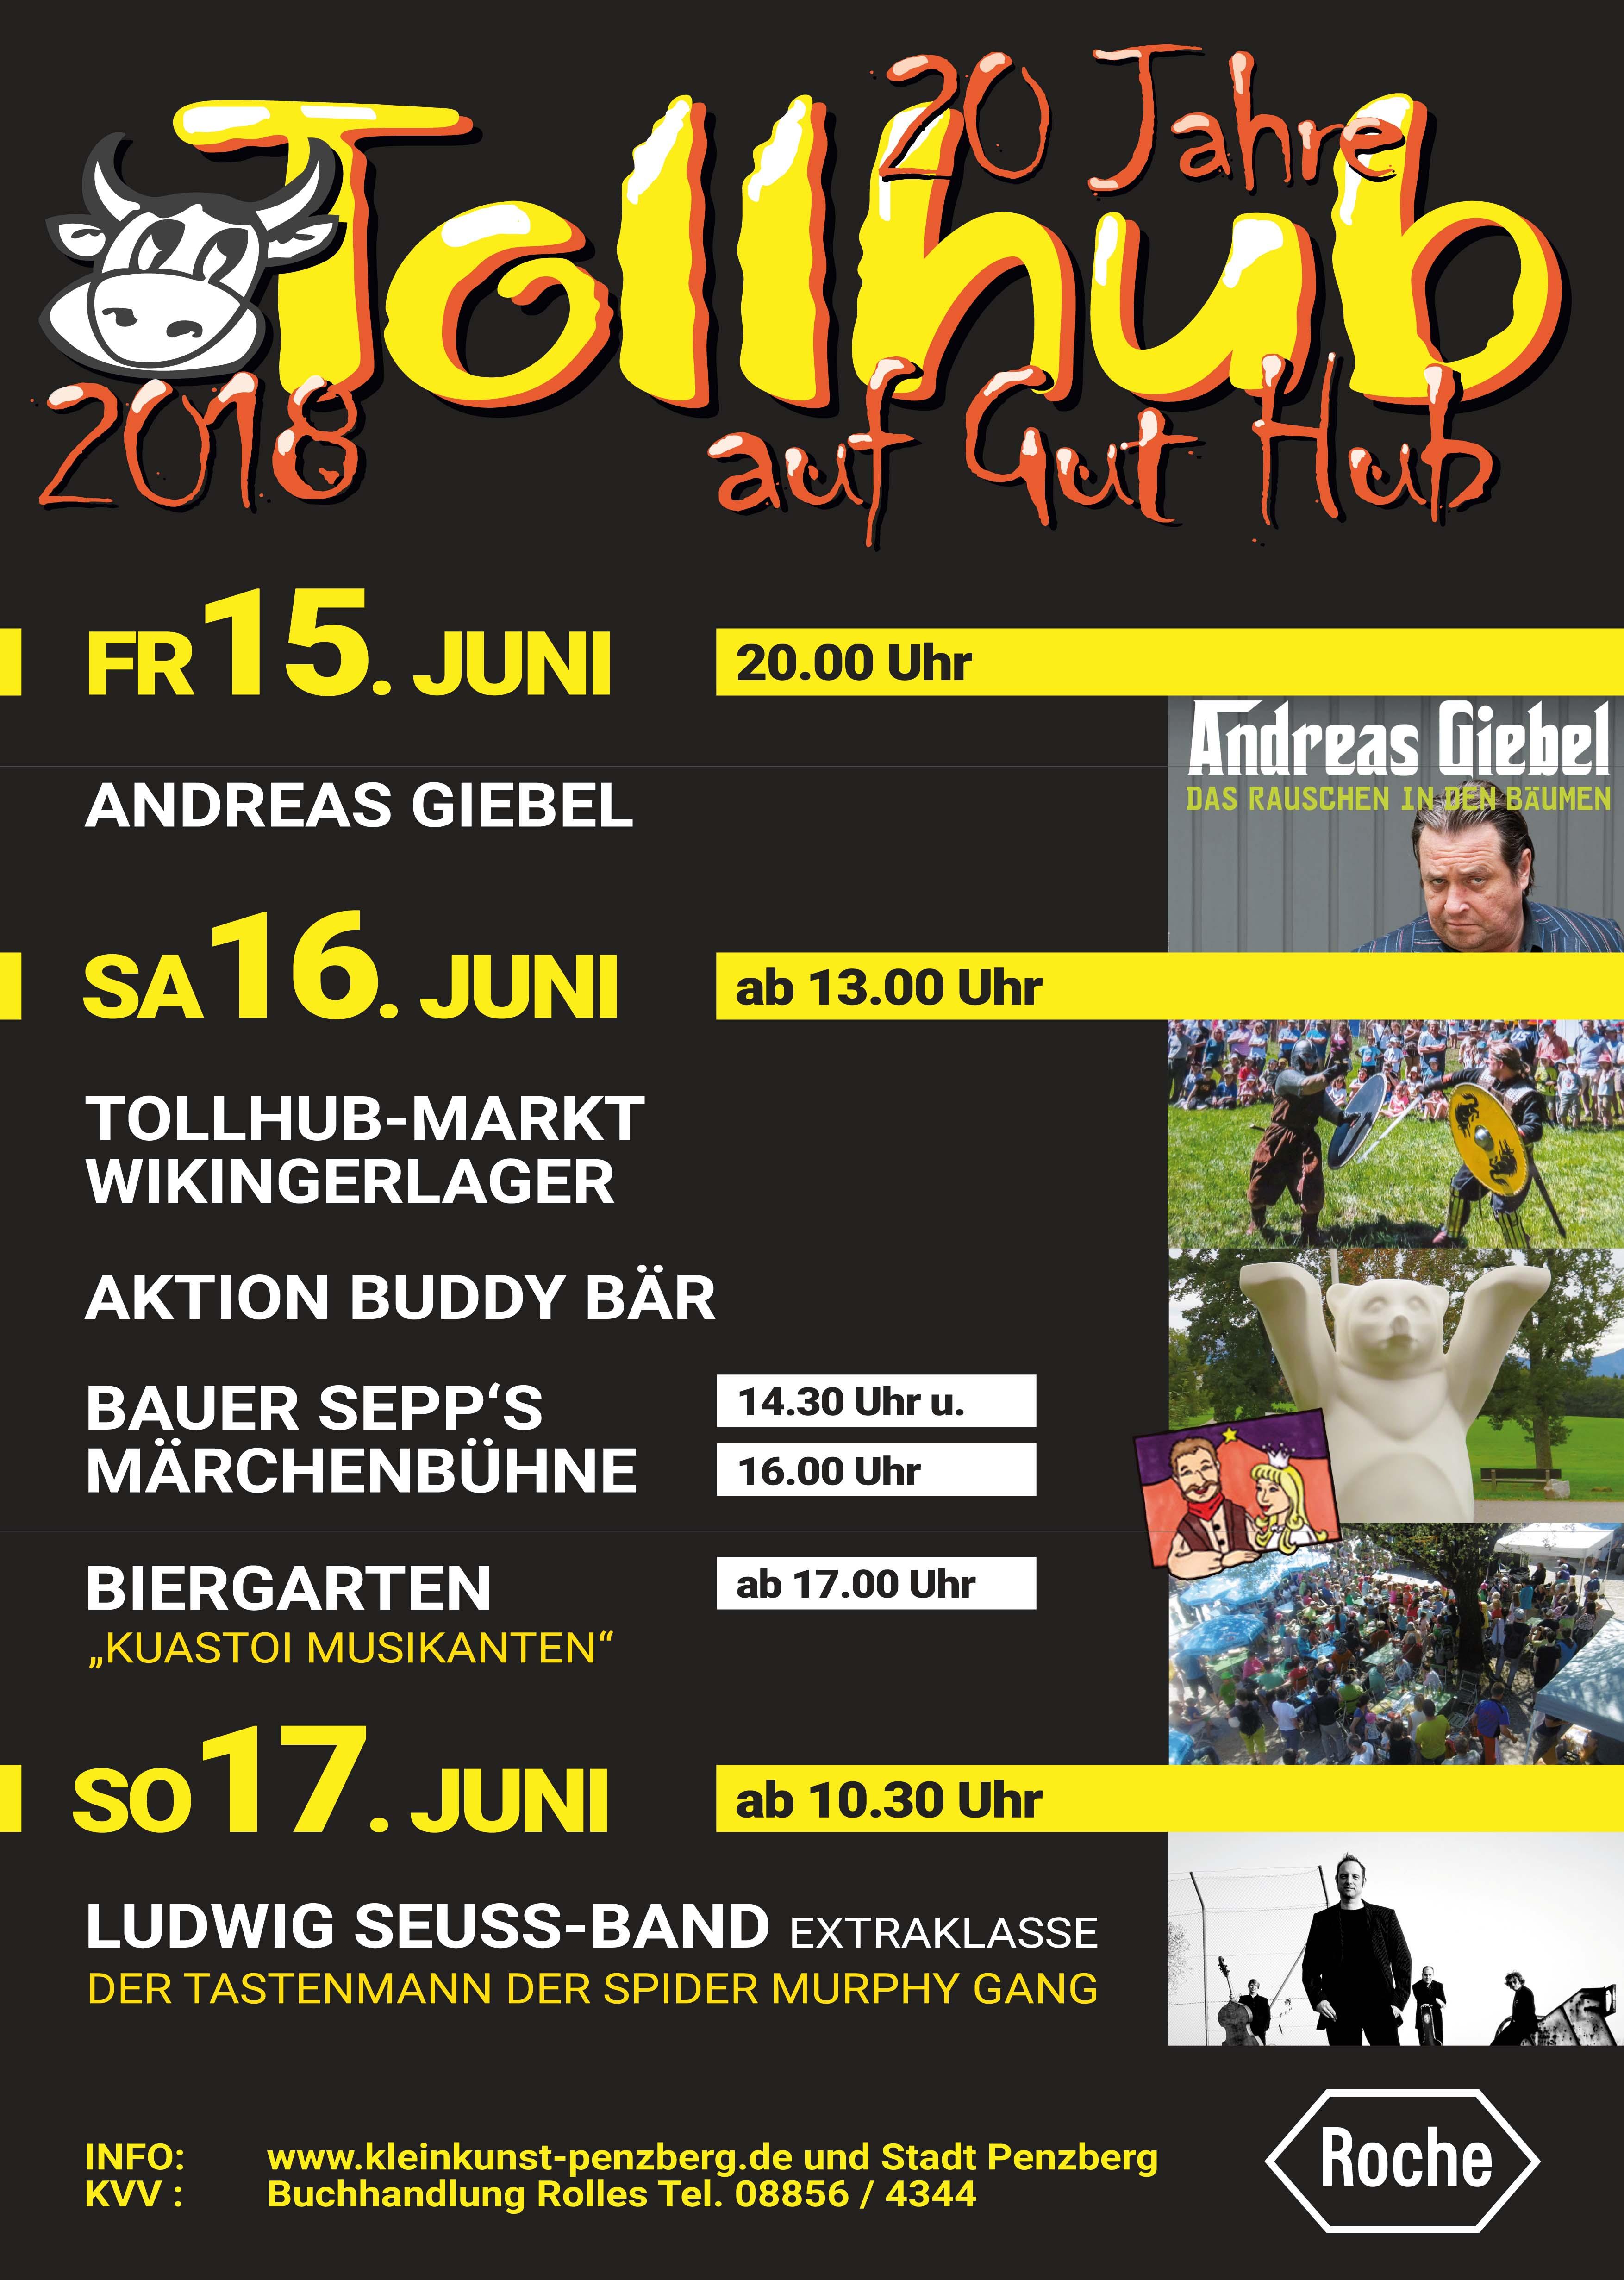 EWO beim Tollhub-Festival am 16.06.2018